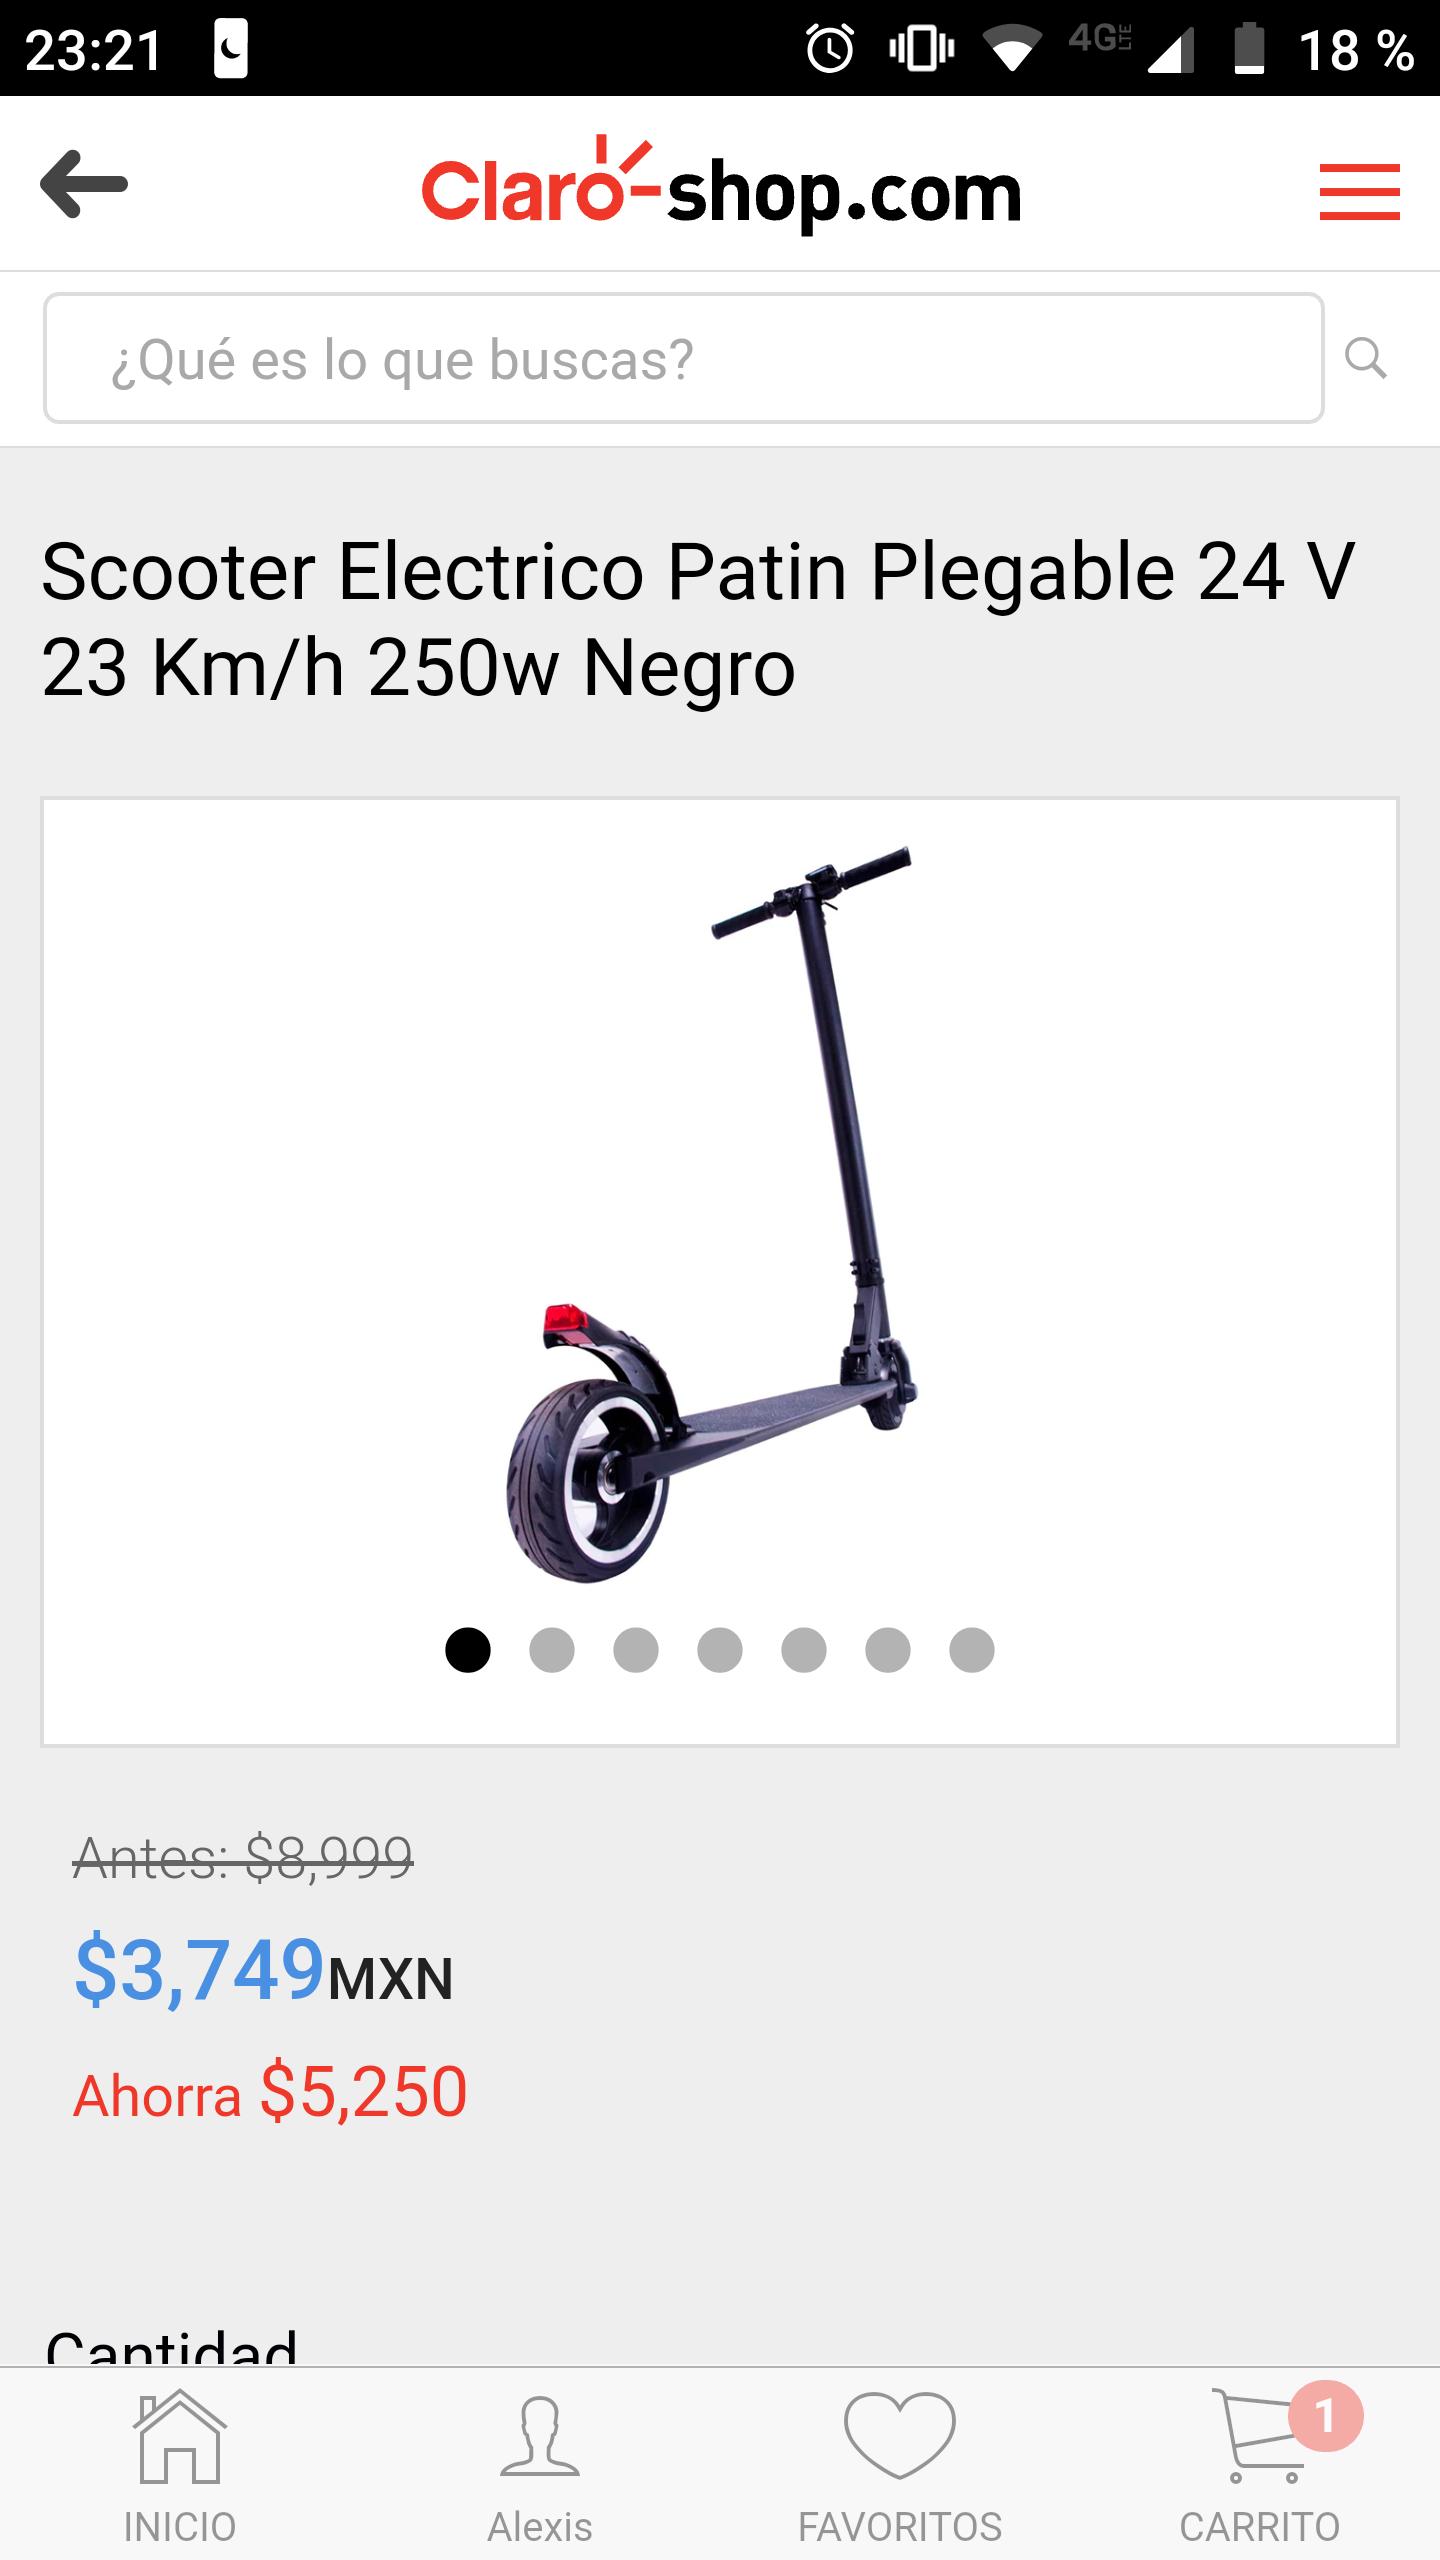 Claro Shop: Scooter Electrico Patin Plegable 24 V 23 Km/h 250w Negro